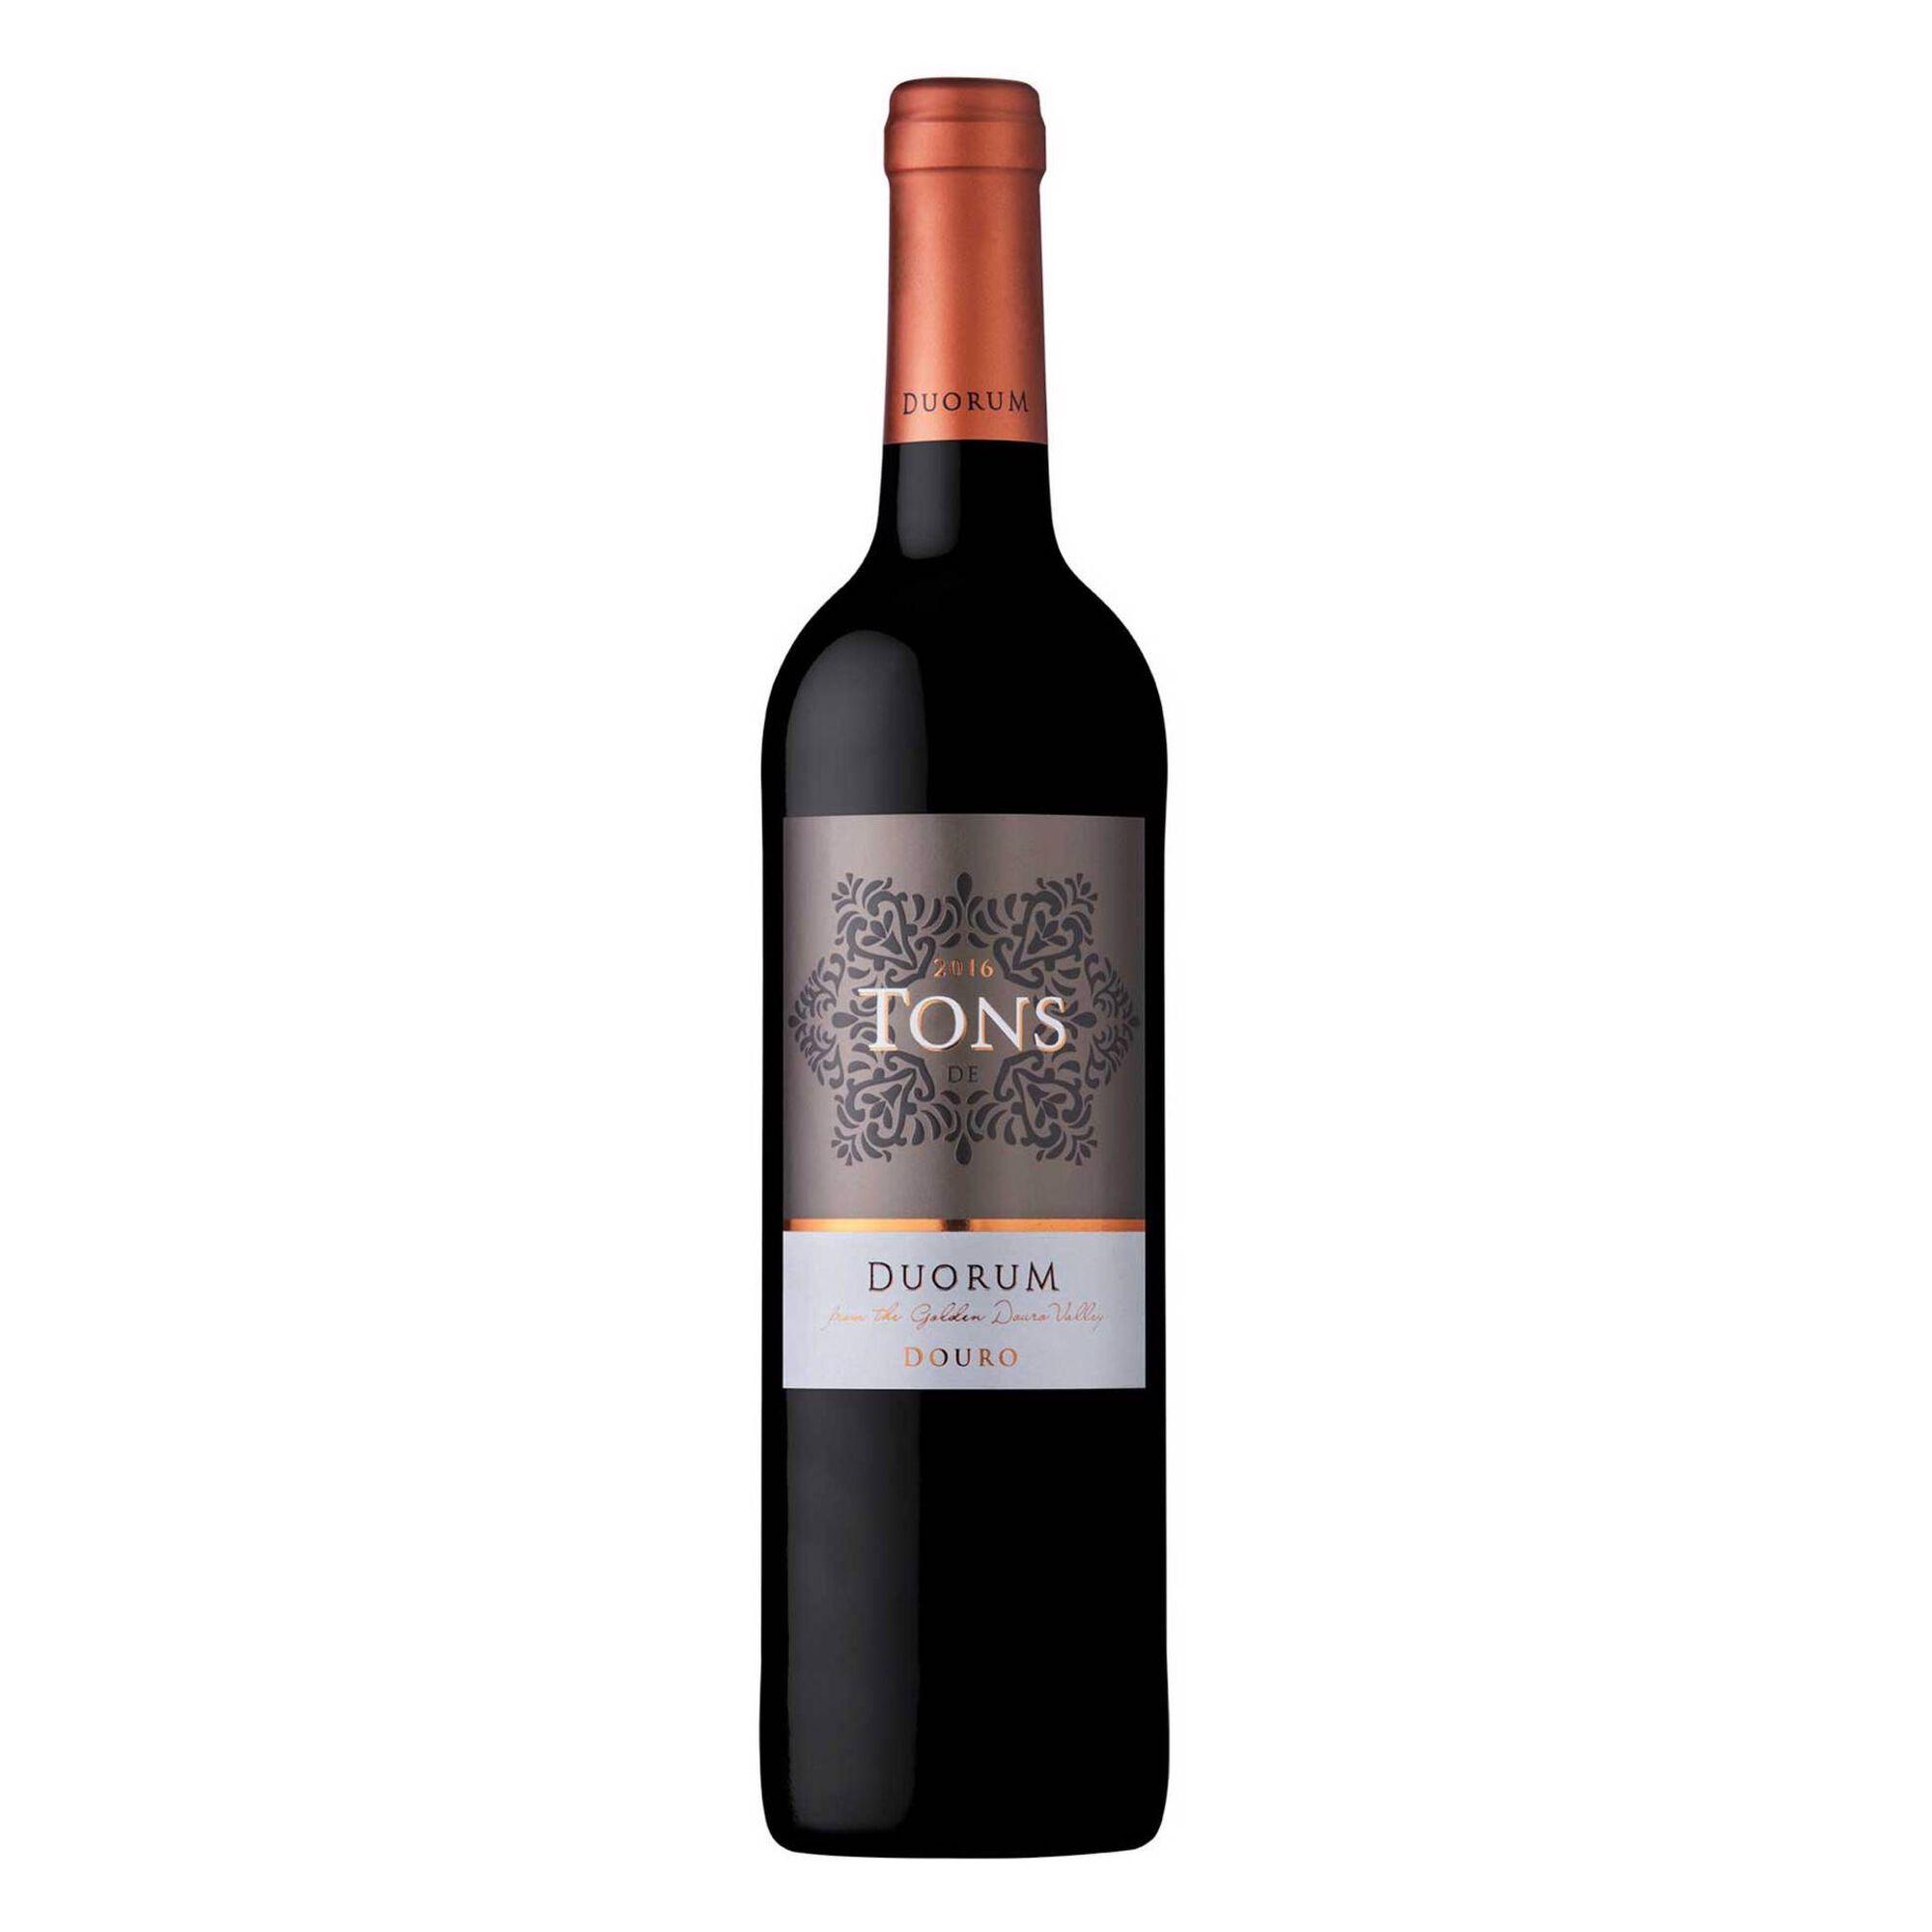 Tons Duorum DOC Douro Vinho Tinto